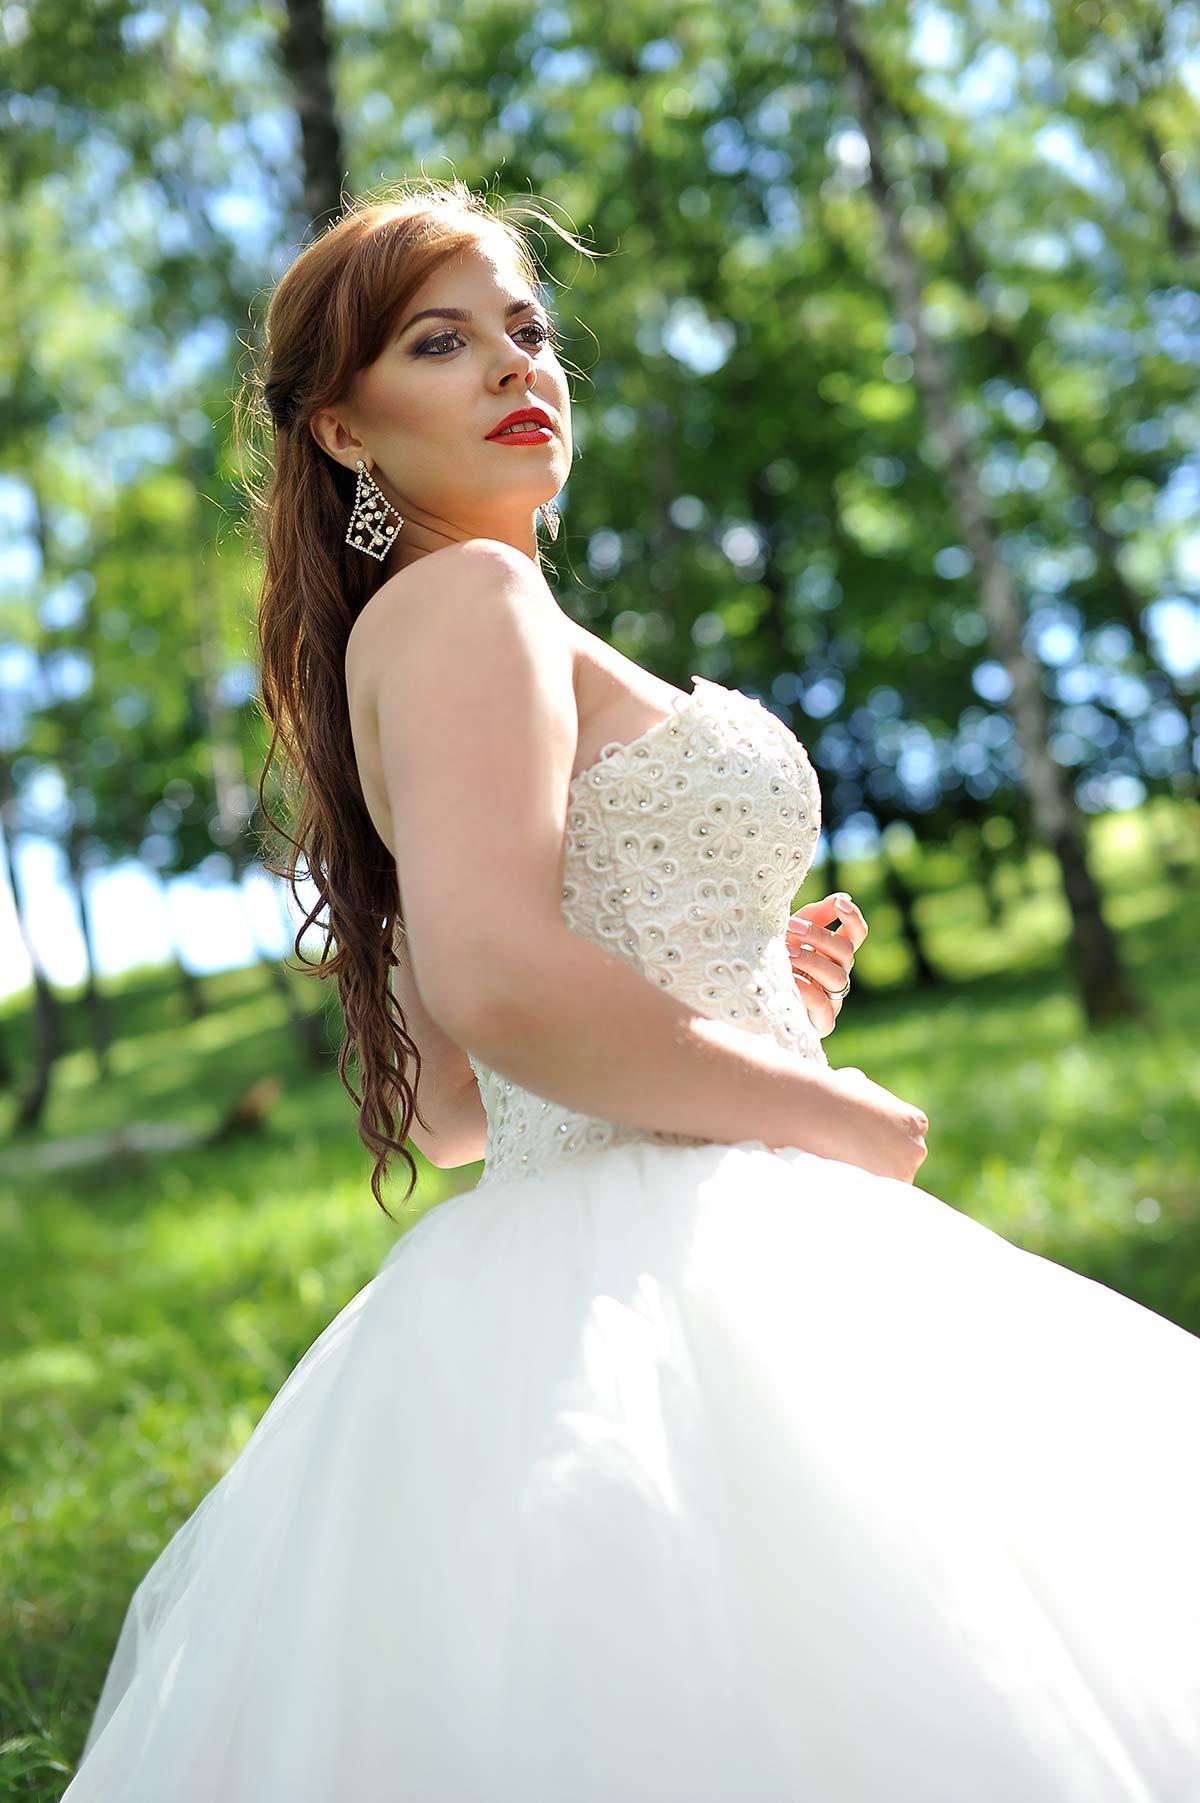 Fotograf pentru sedinta foto nunta, fotografii nunta Bacau